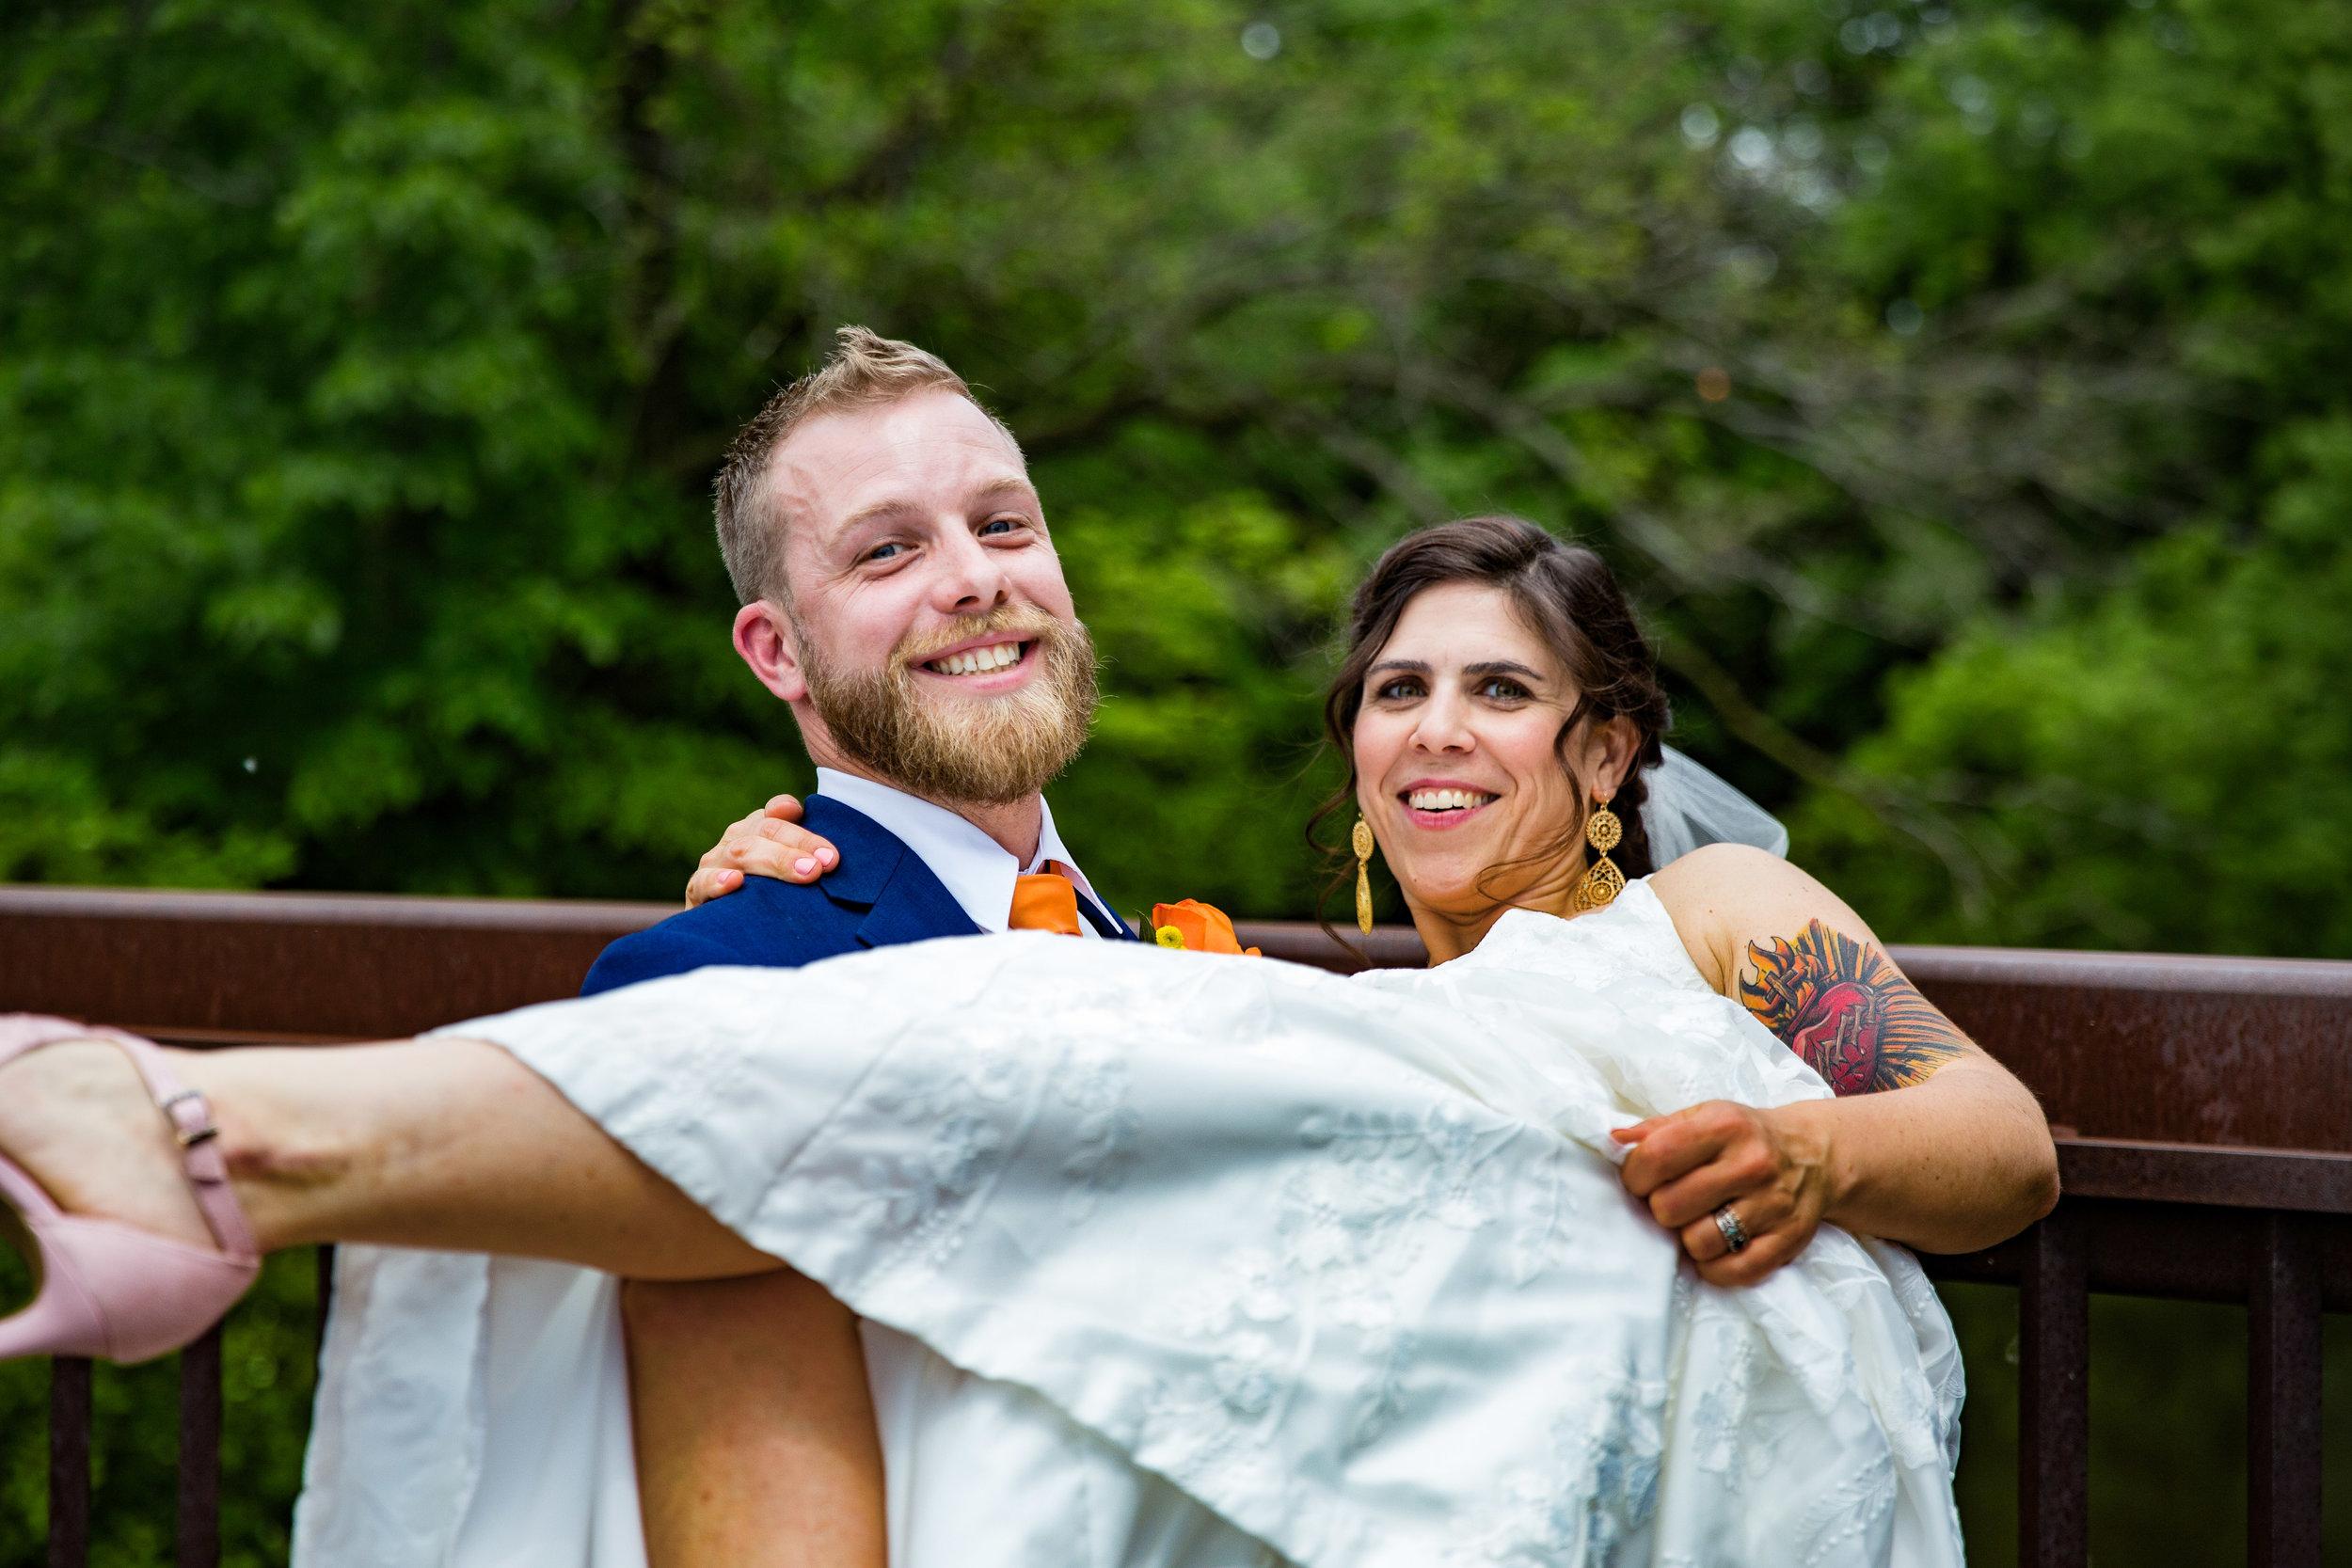 Natalie and Dallas Mooney Wedding 6-8-19_Tania Watt Photography-249.jpg